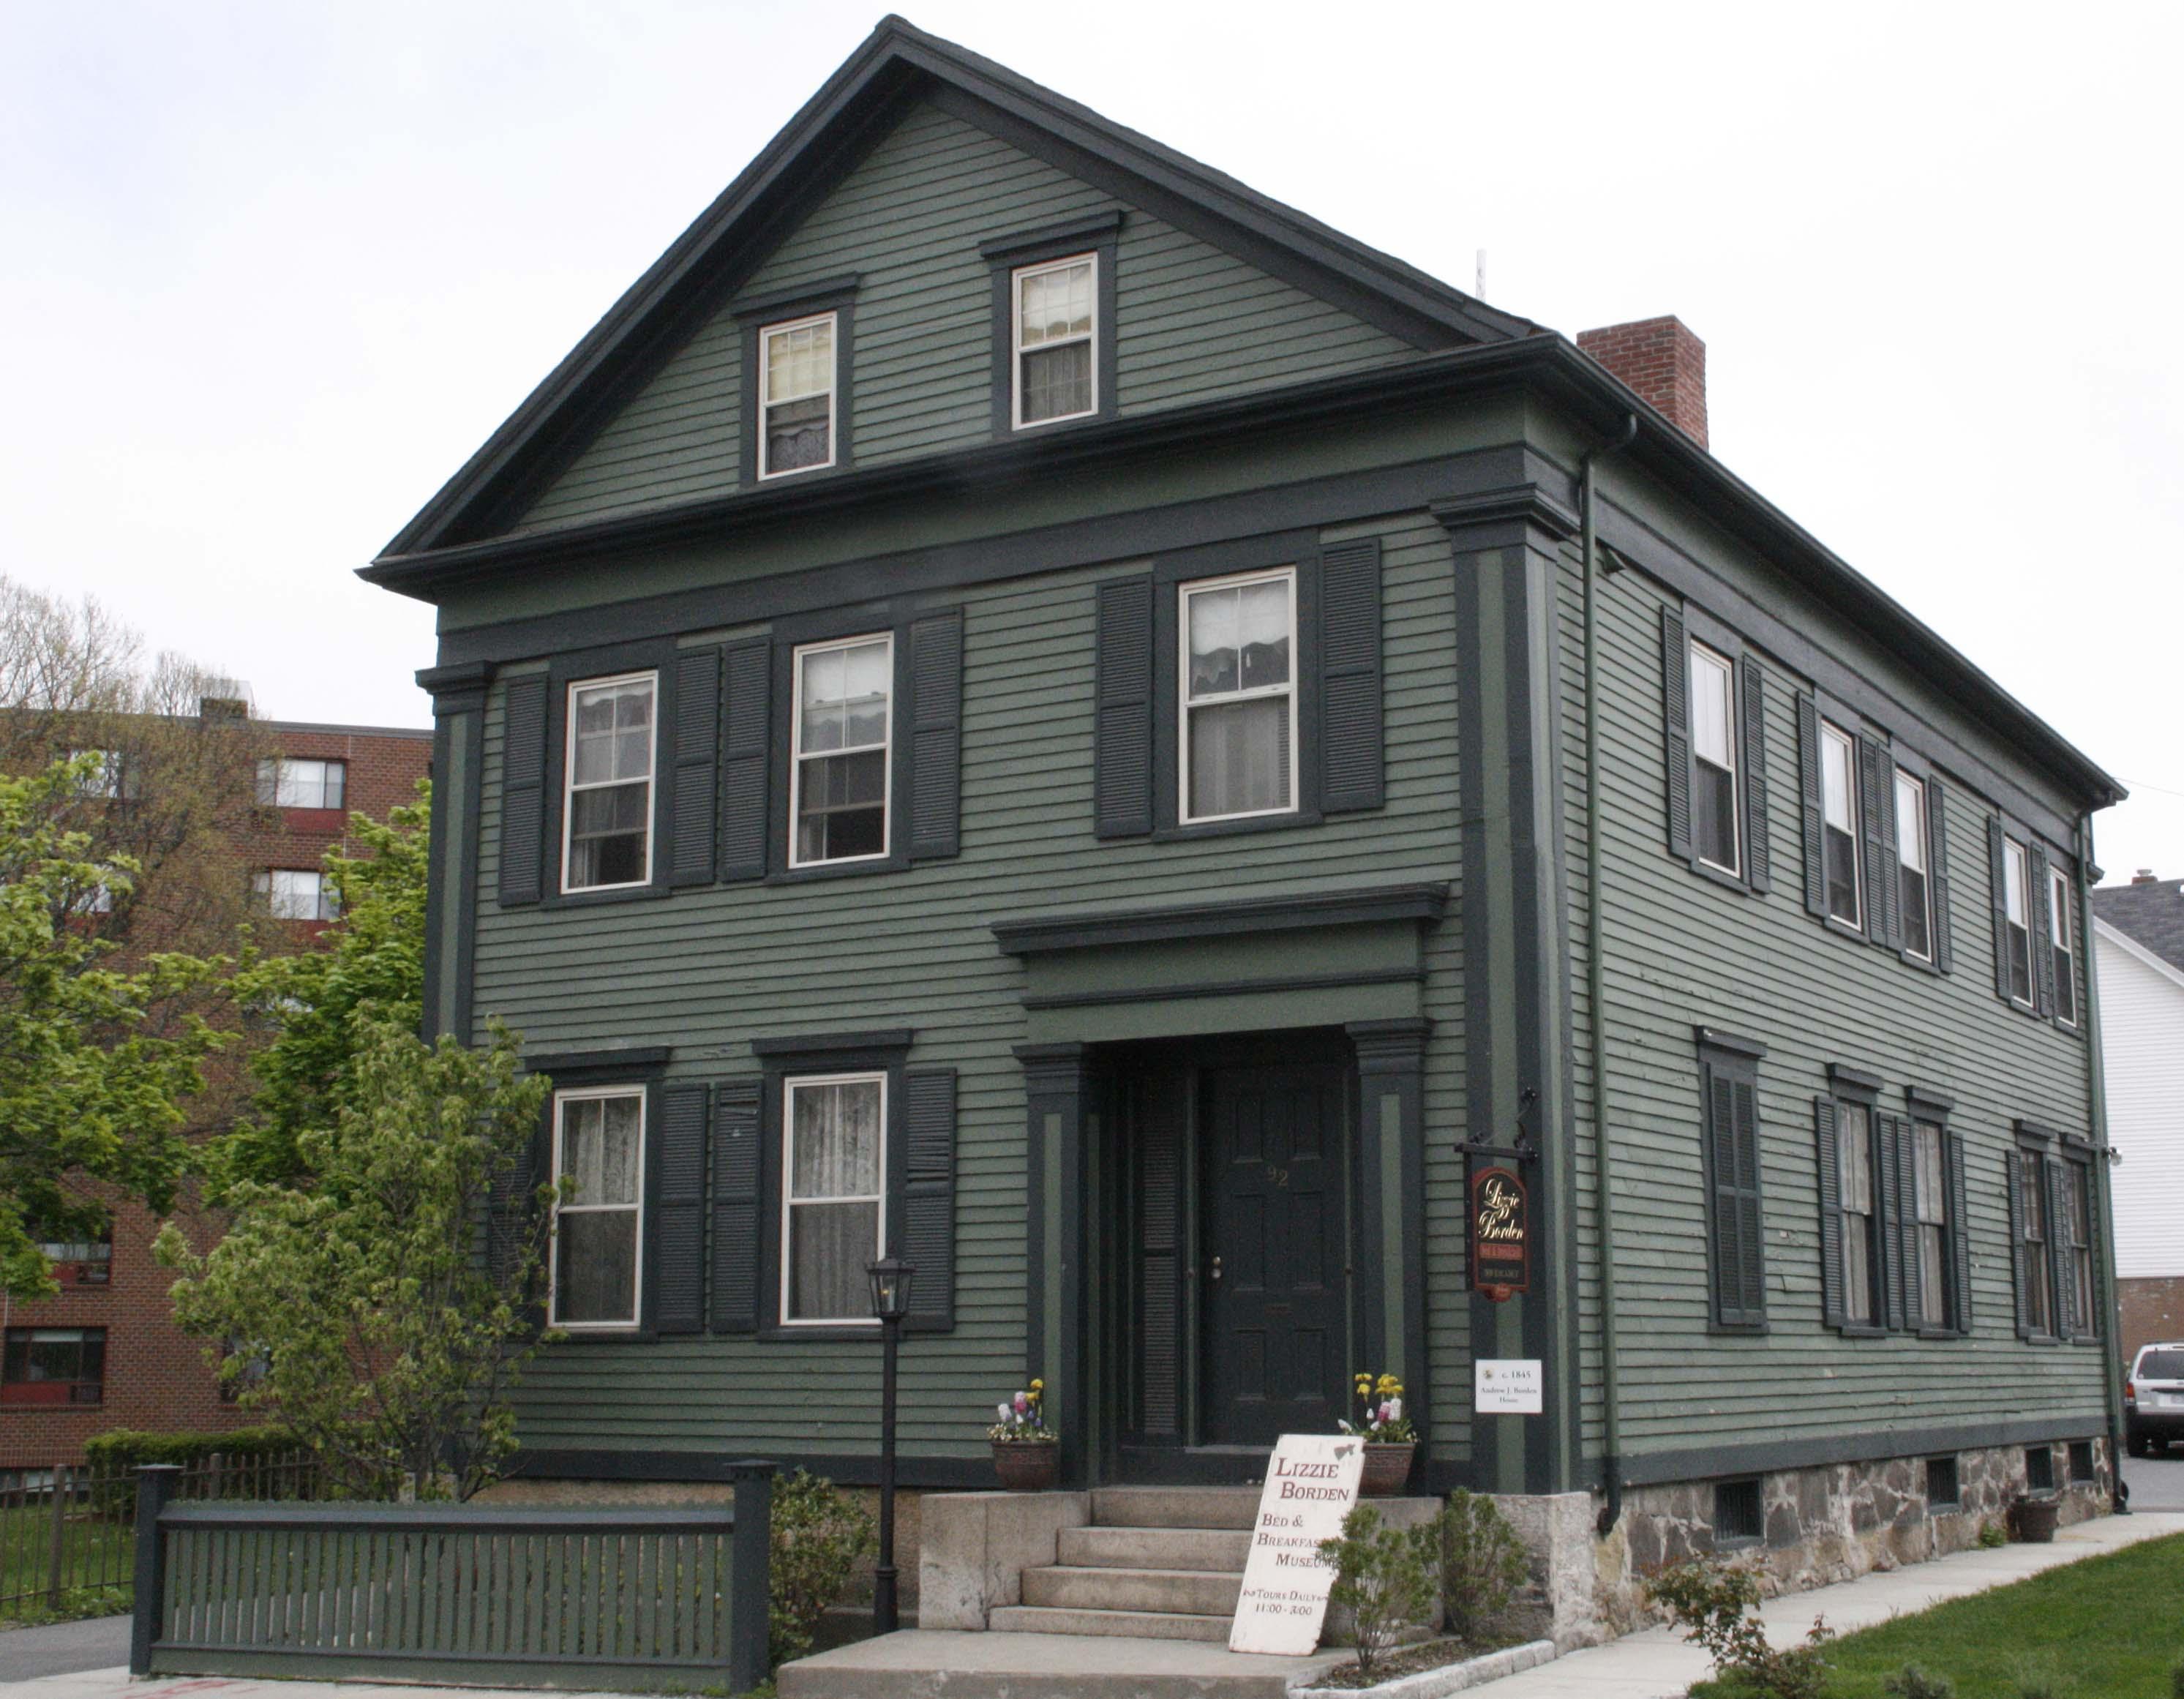 Lizzie Borden House - Wikipedia